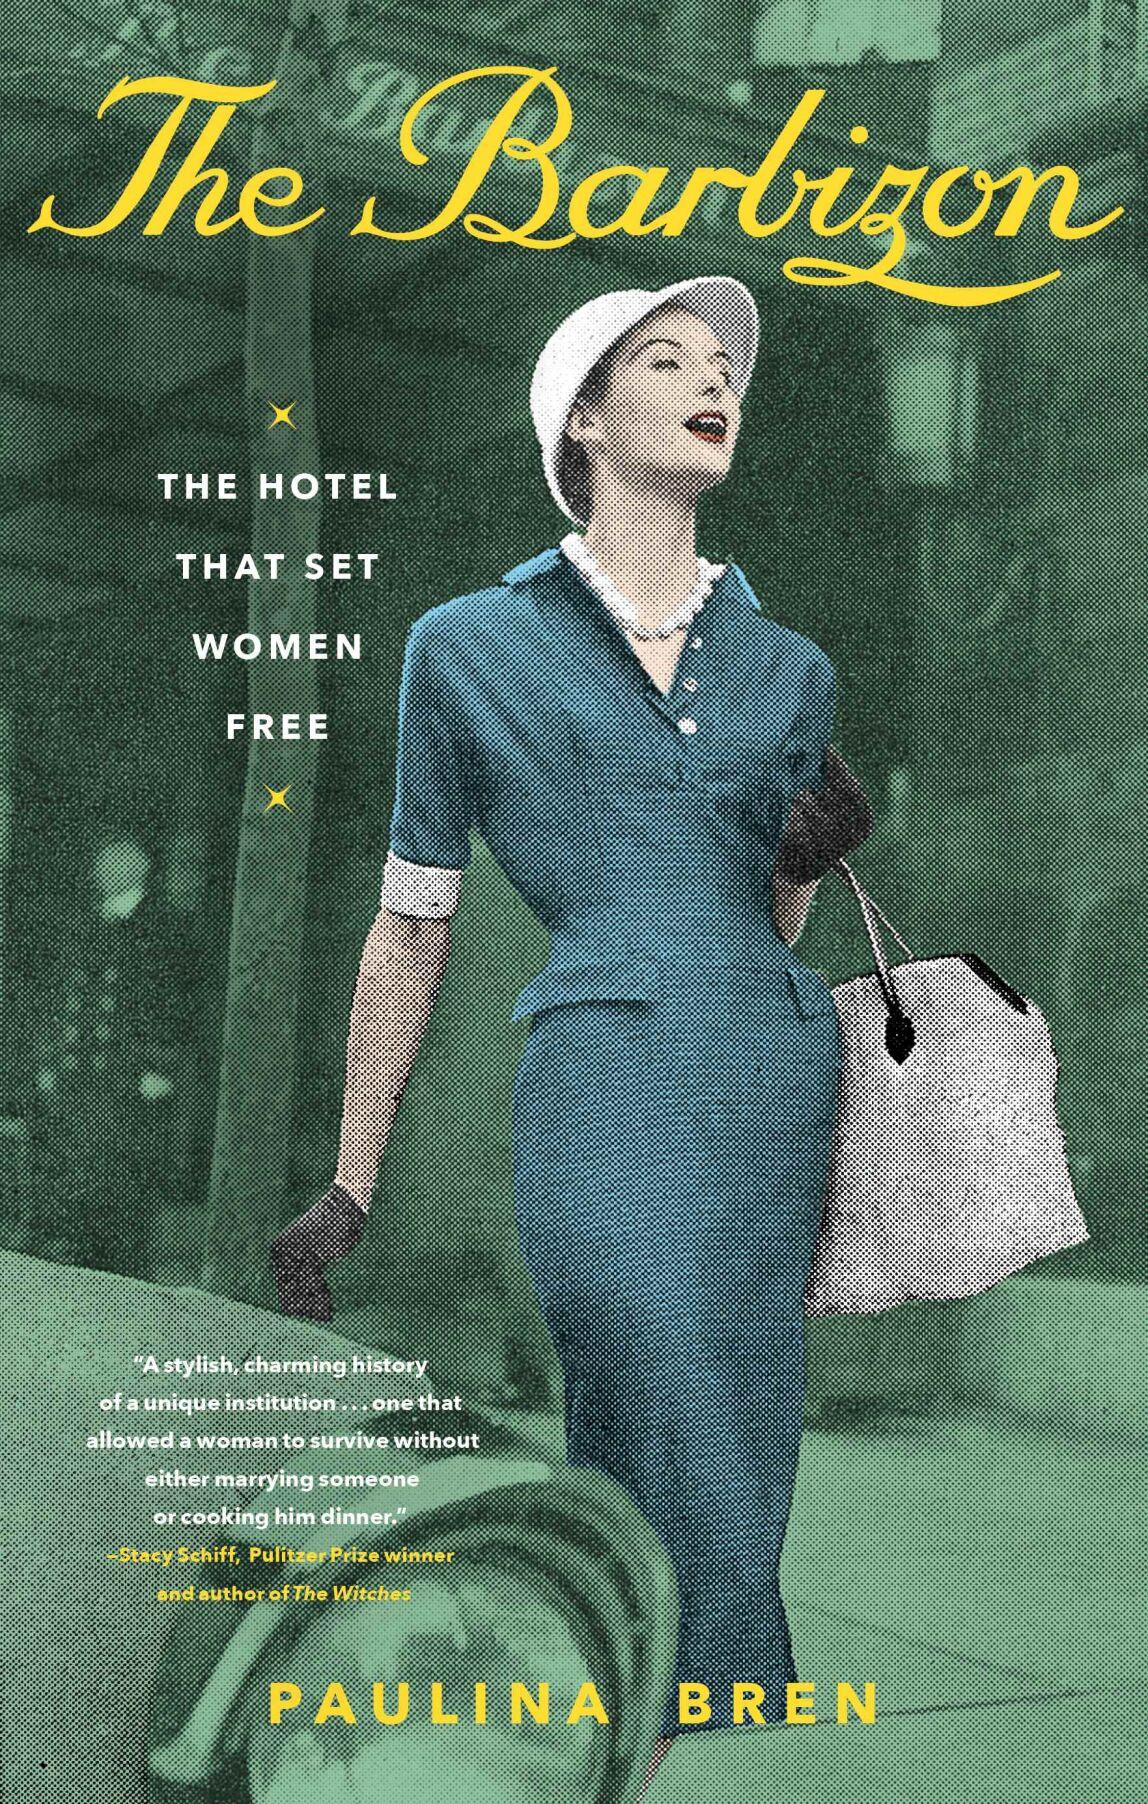 """The Barbizon: The Hotel That Set Women Free"""